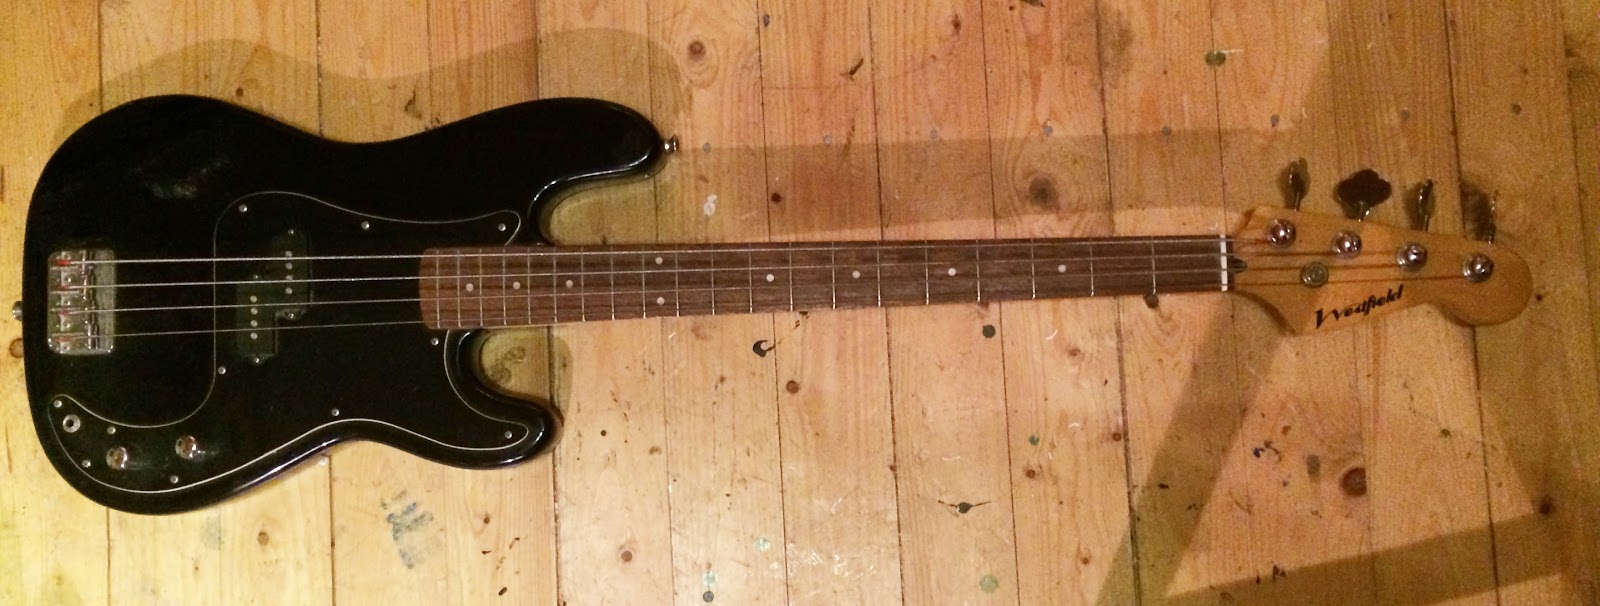 ZR_6178] Champ Cba500 Bass Guitar Amplifier Schematicwiring DiagramIttab Unpr Faun Hapolo Mohammedshrine Librar Wiring 101